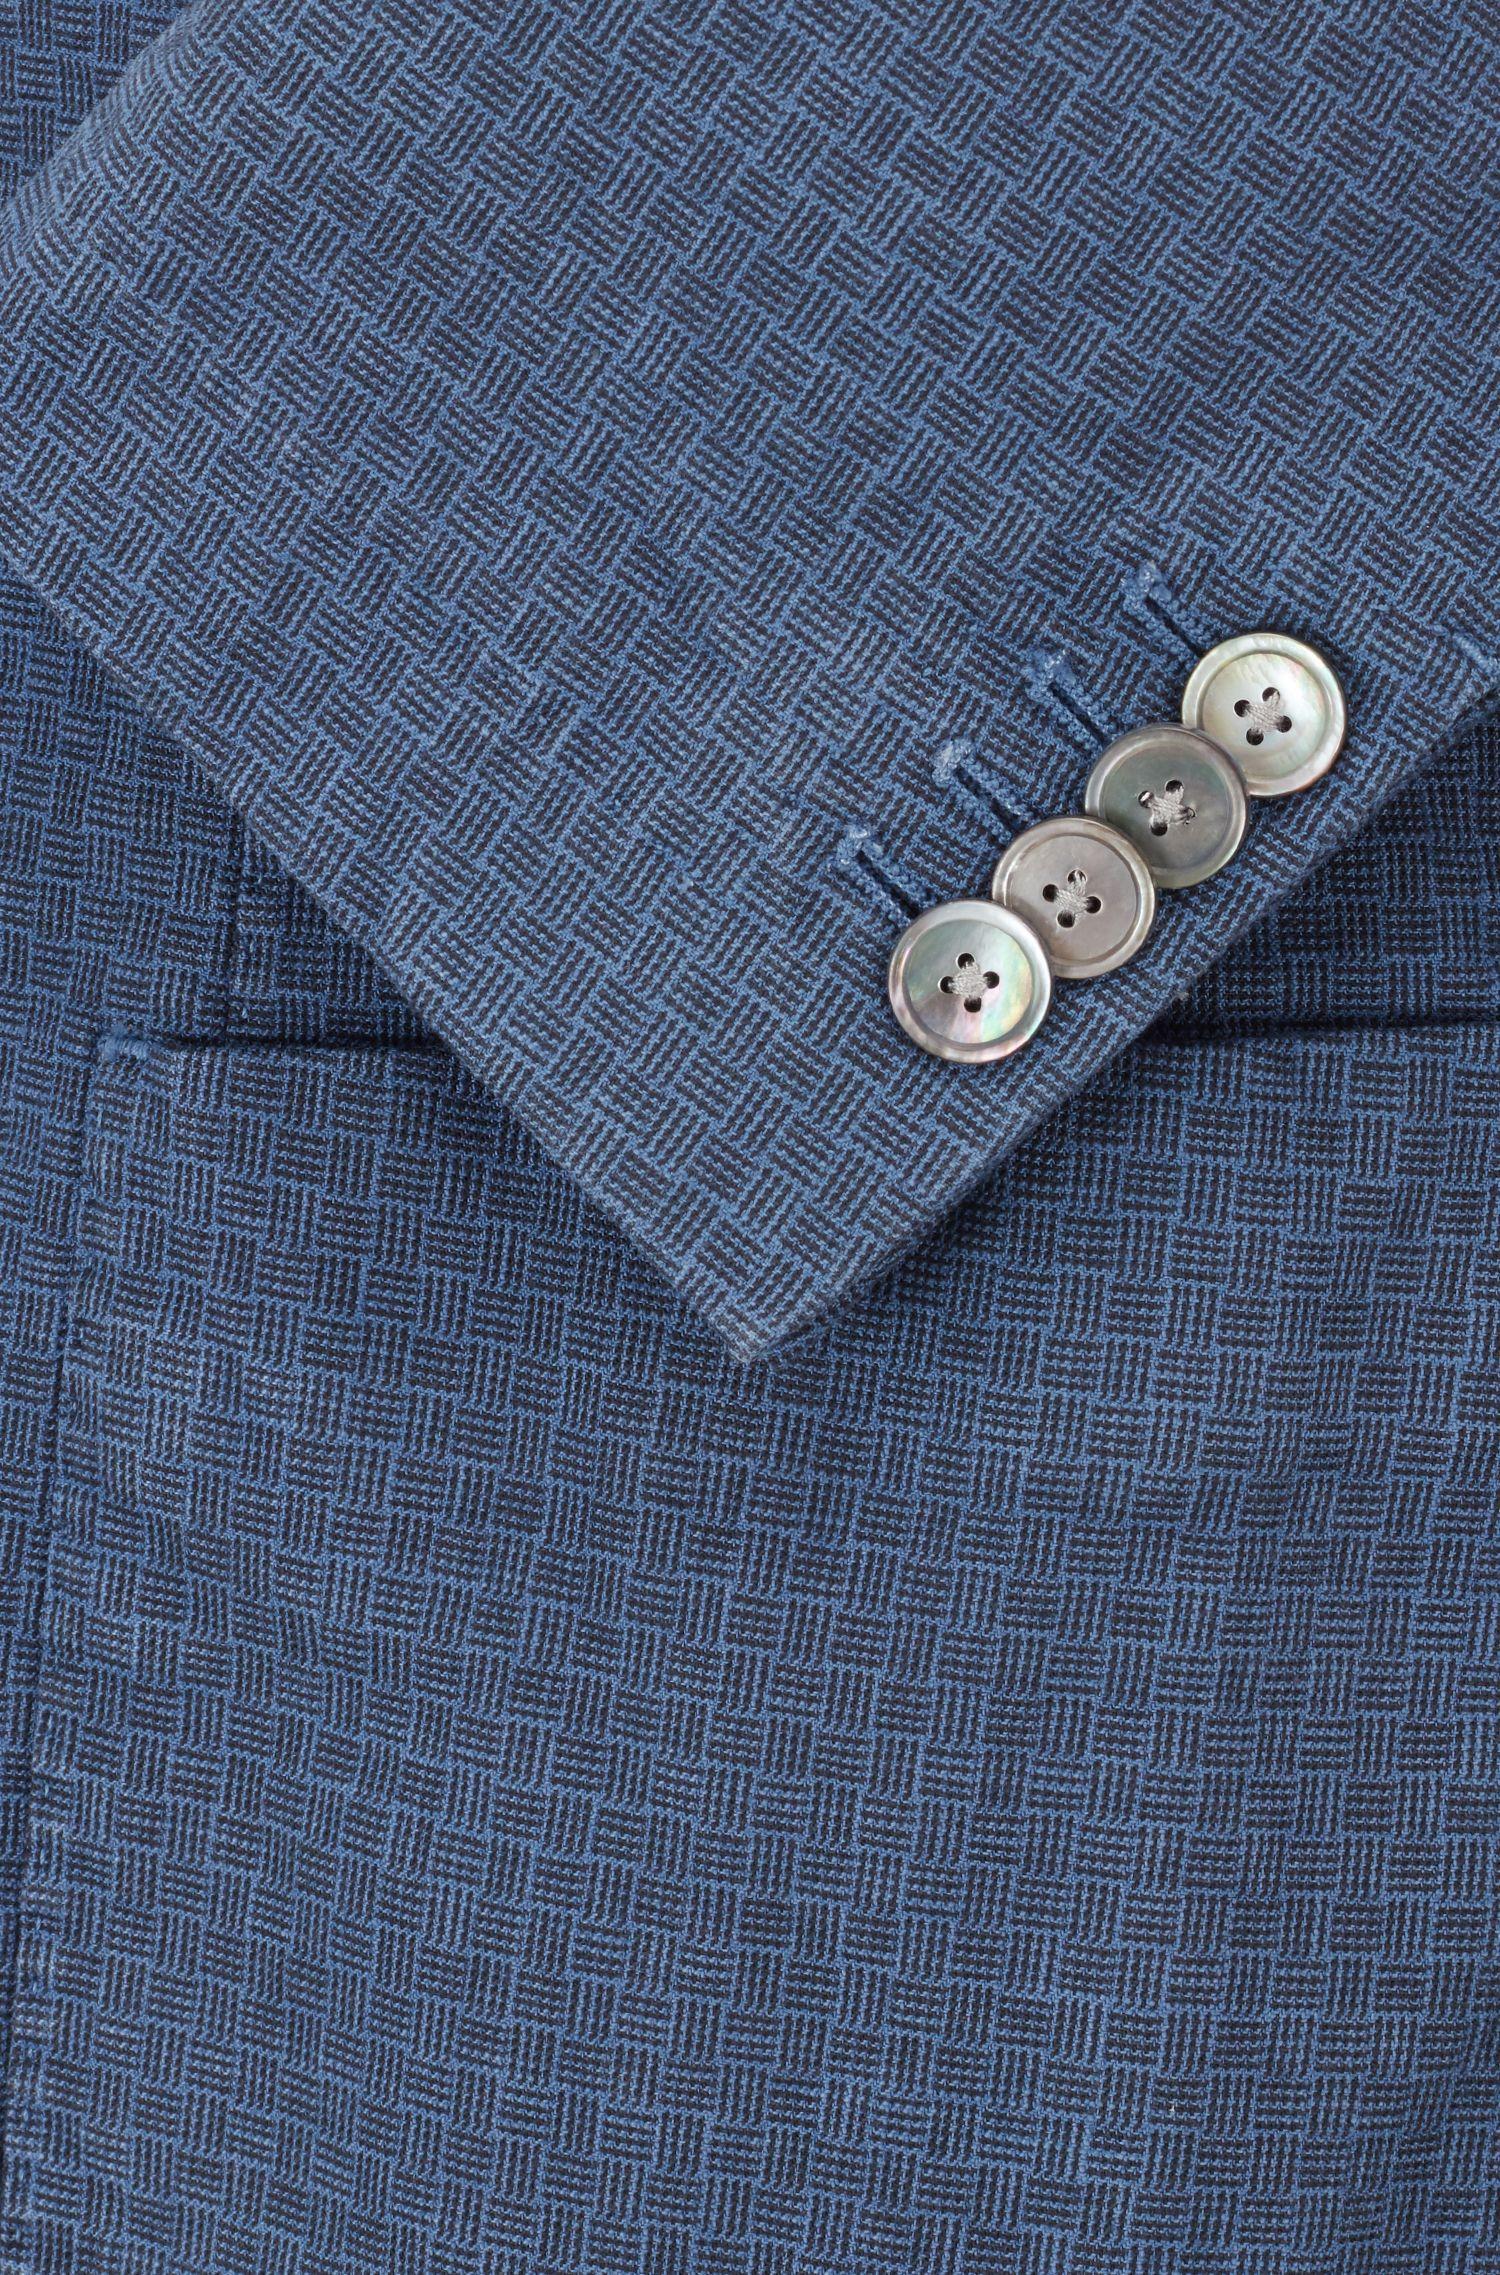 Slim-fit blazer in garment-dyed stretch cotton, Blue